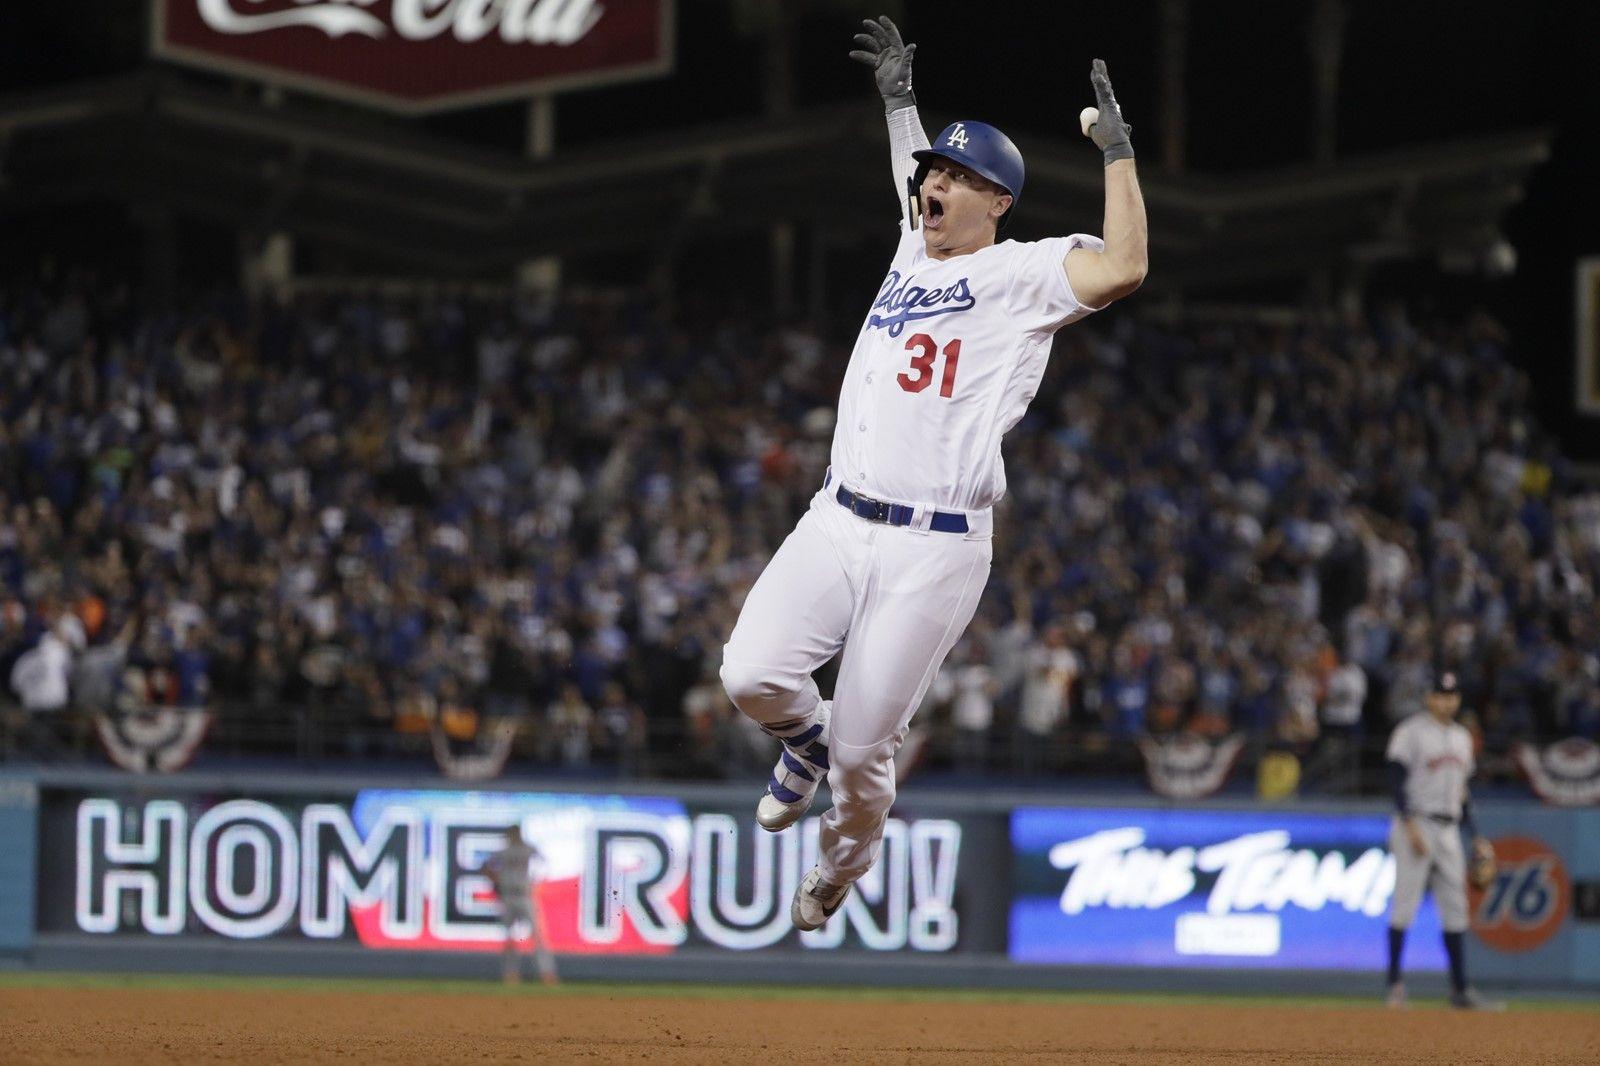 Los Angeles Times Dodgers baseball, Love my boys